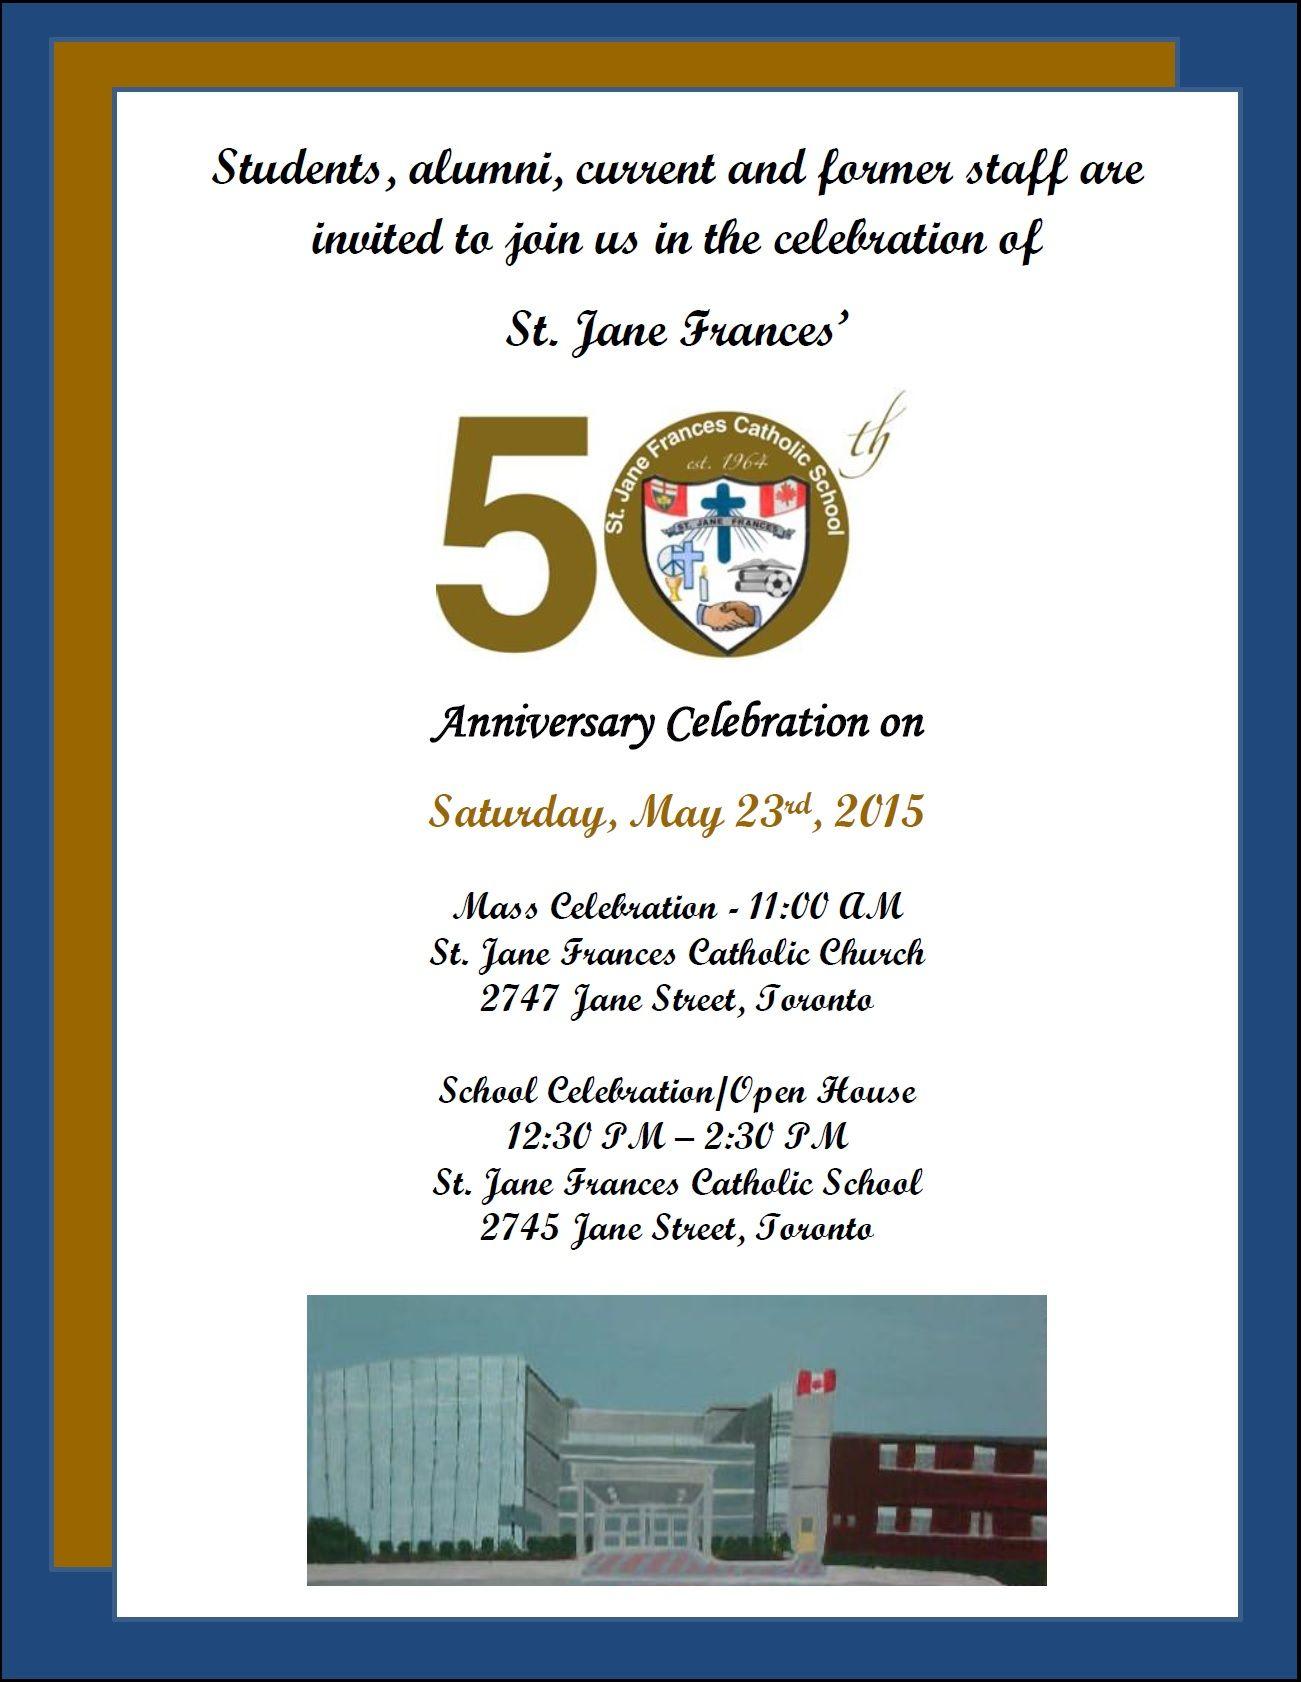 catholic school anniversary - Google Search | RWA 50th celebration ...